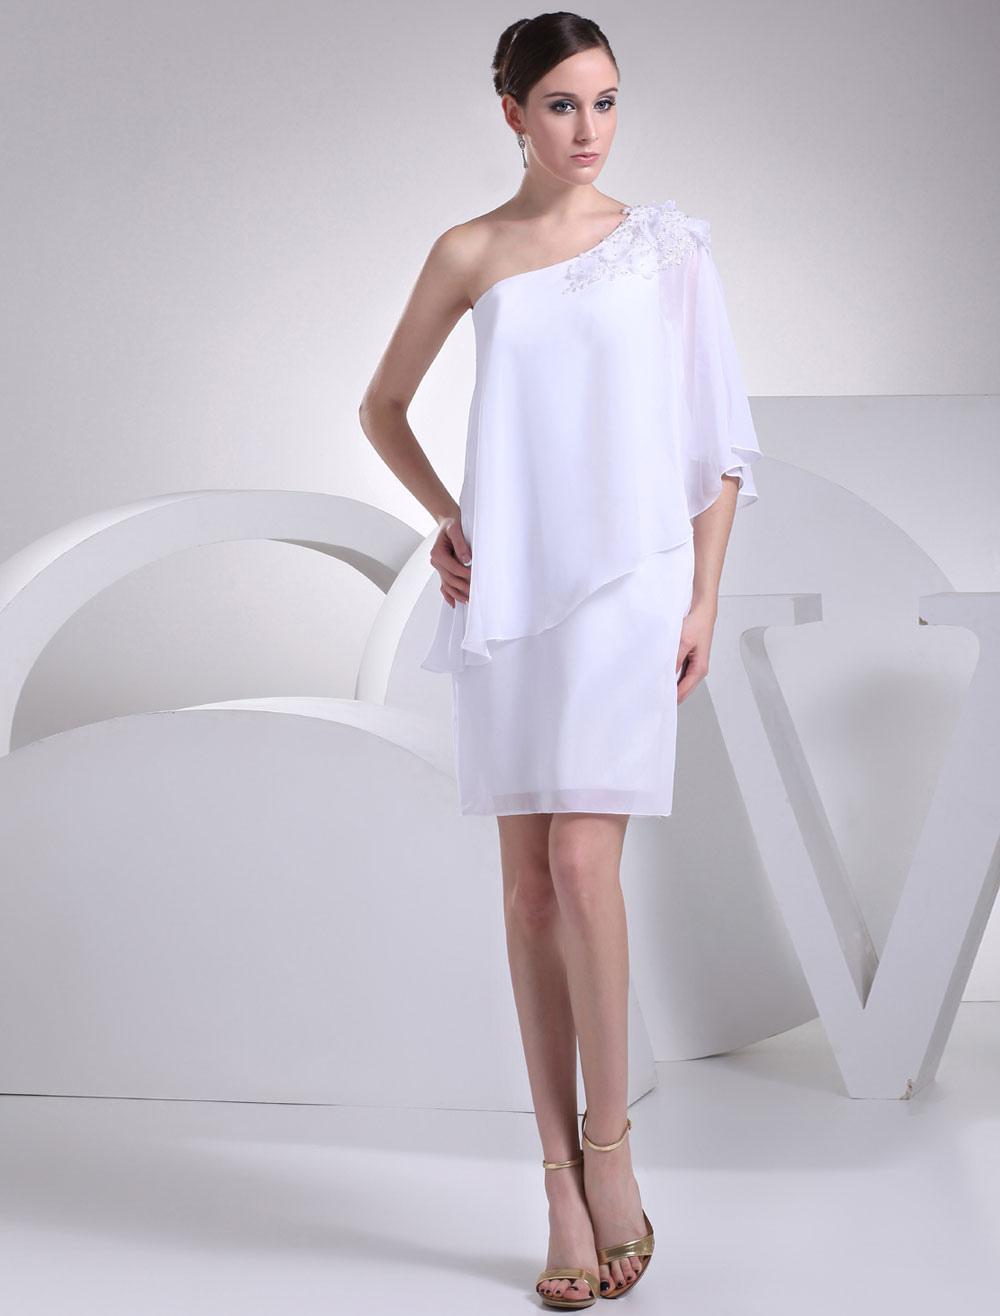 White Bridesmaid Dress One-Shoulder Applique Beading Flower Sheath Knee-Length Wedding Party Dress (Bridesmaid Dresses) photo